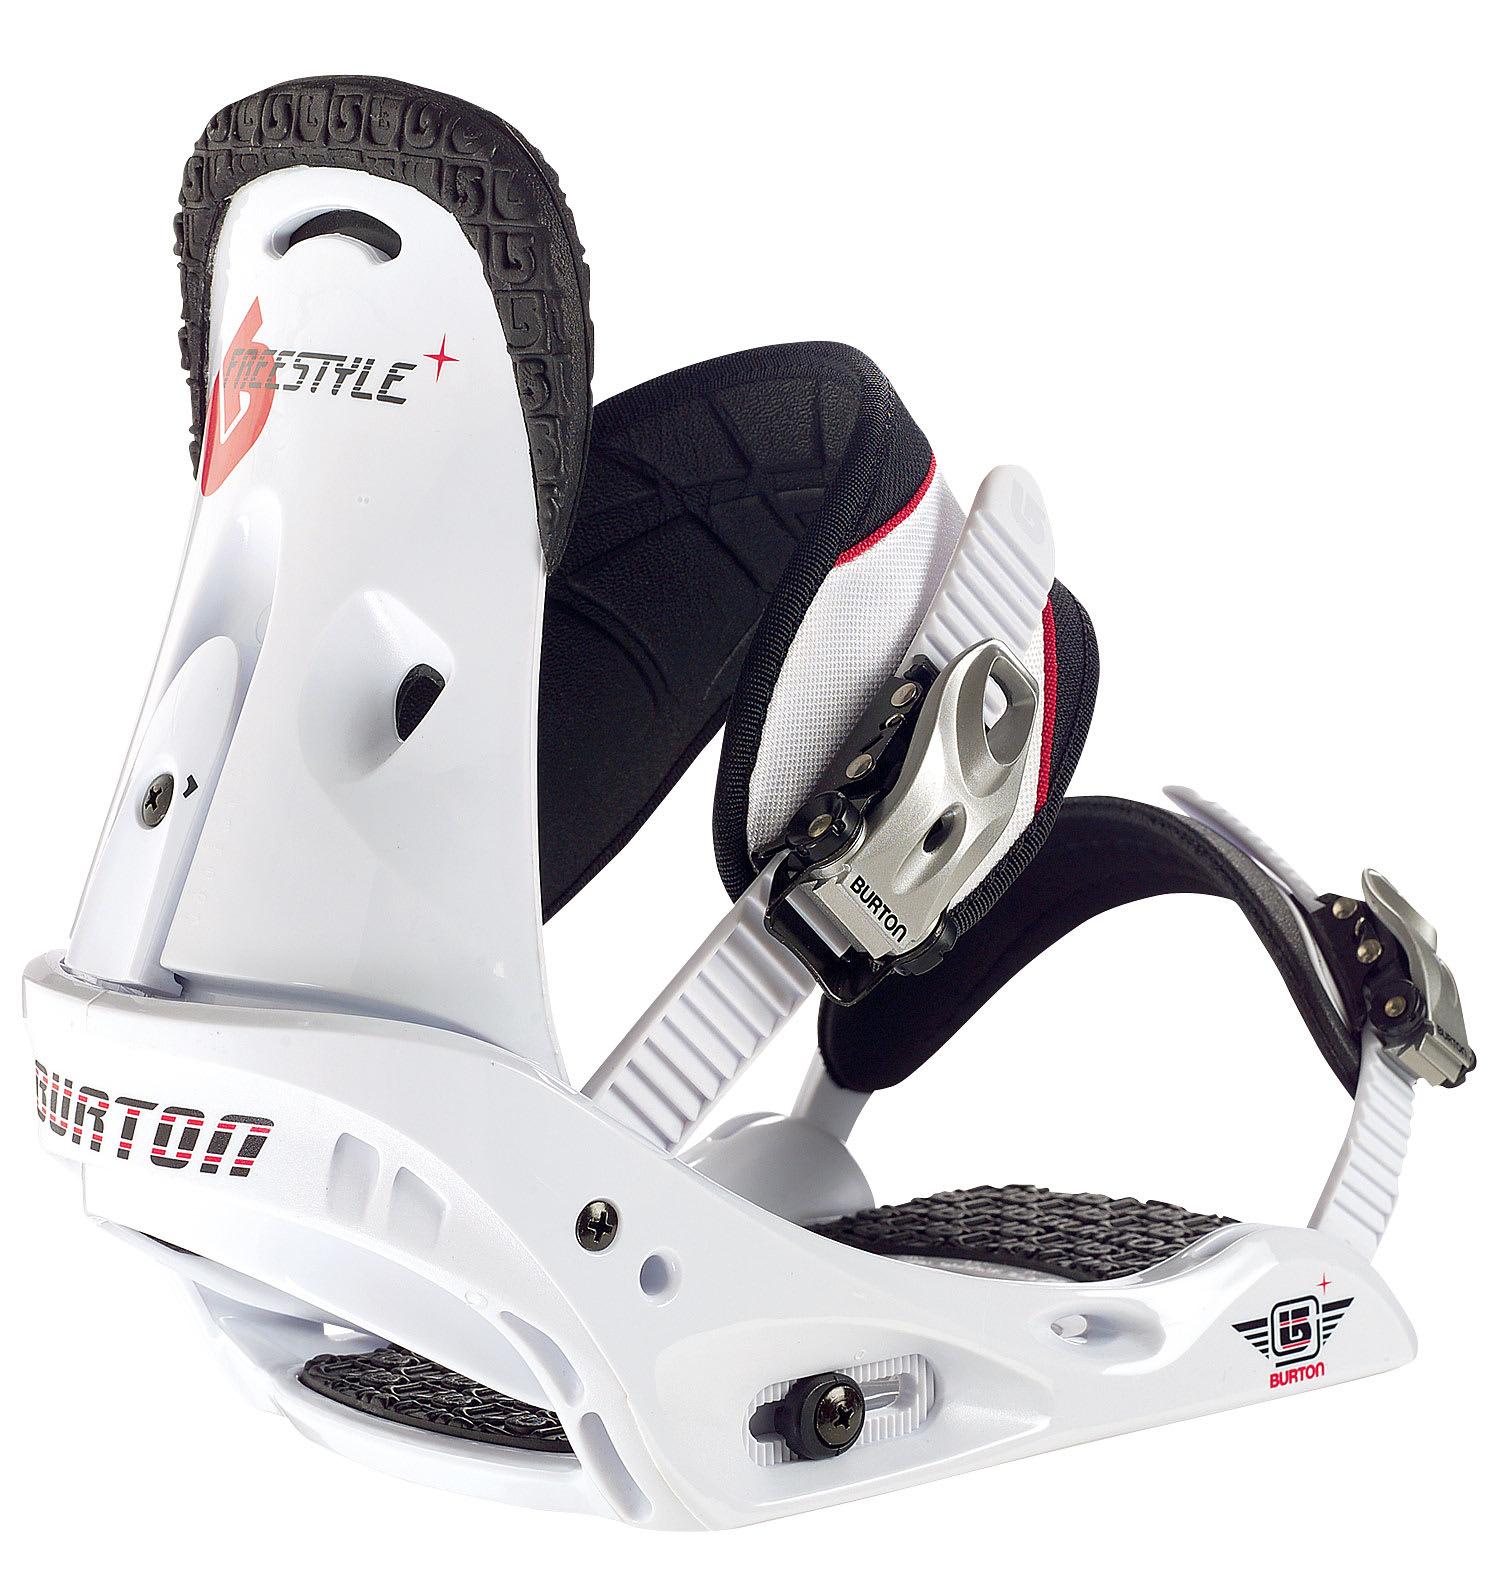 On Sale Burton Freestyle Snowboard Bindings Up To 80% Off